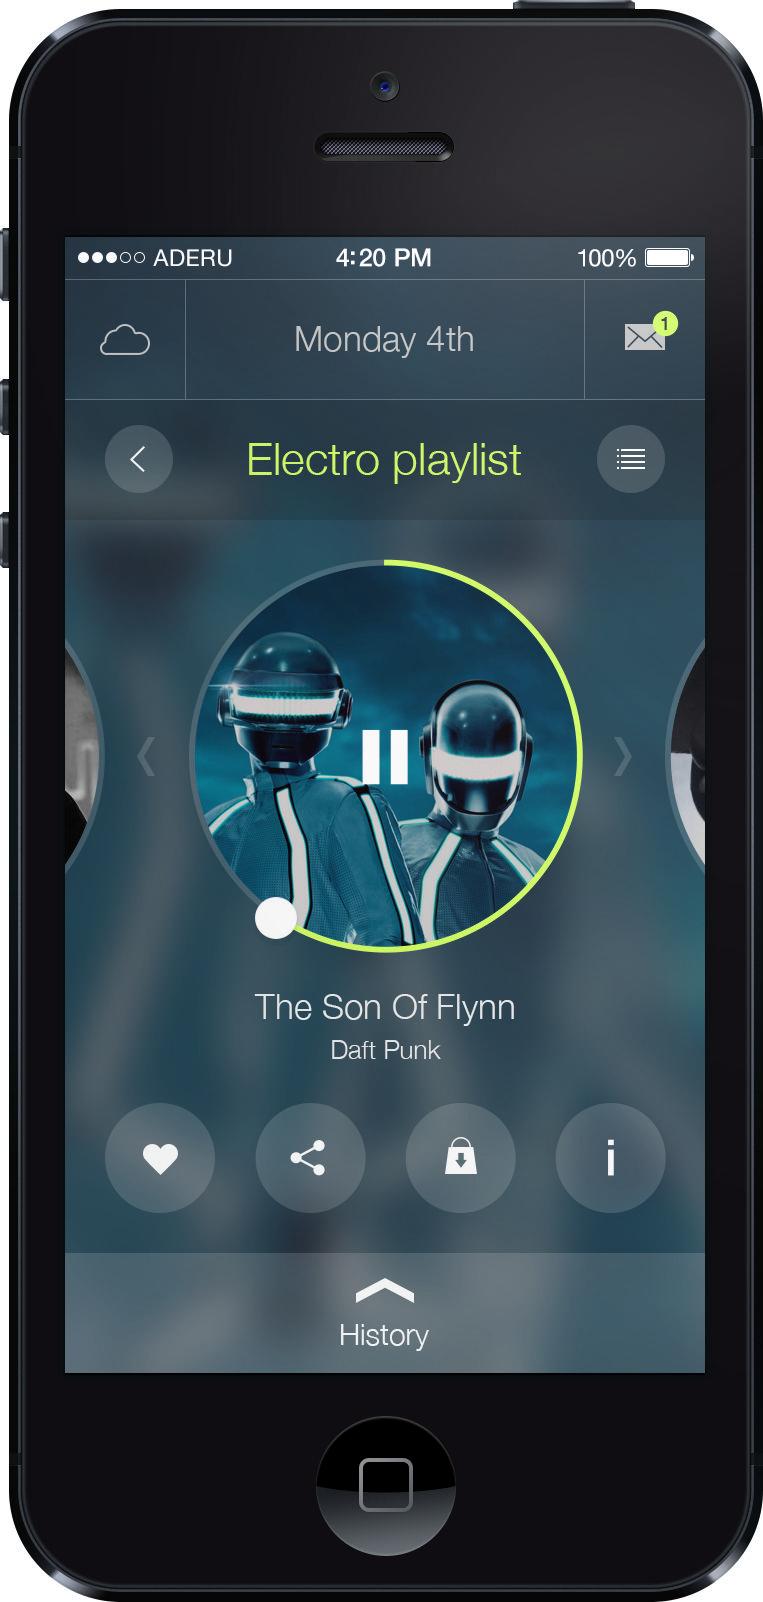 Ios 7 app ui music player psd http www dailyfreepsd